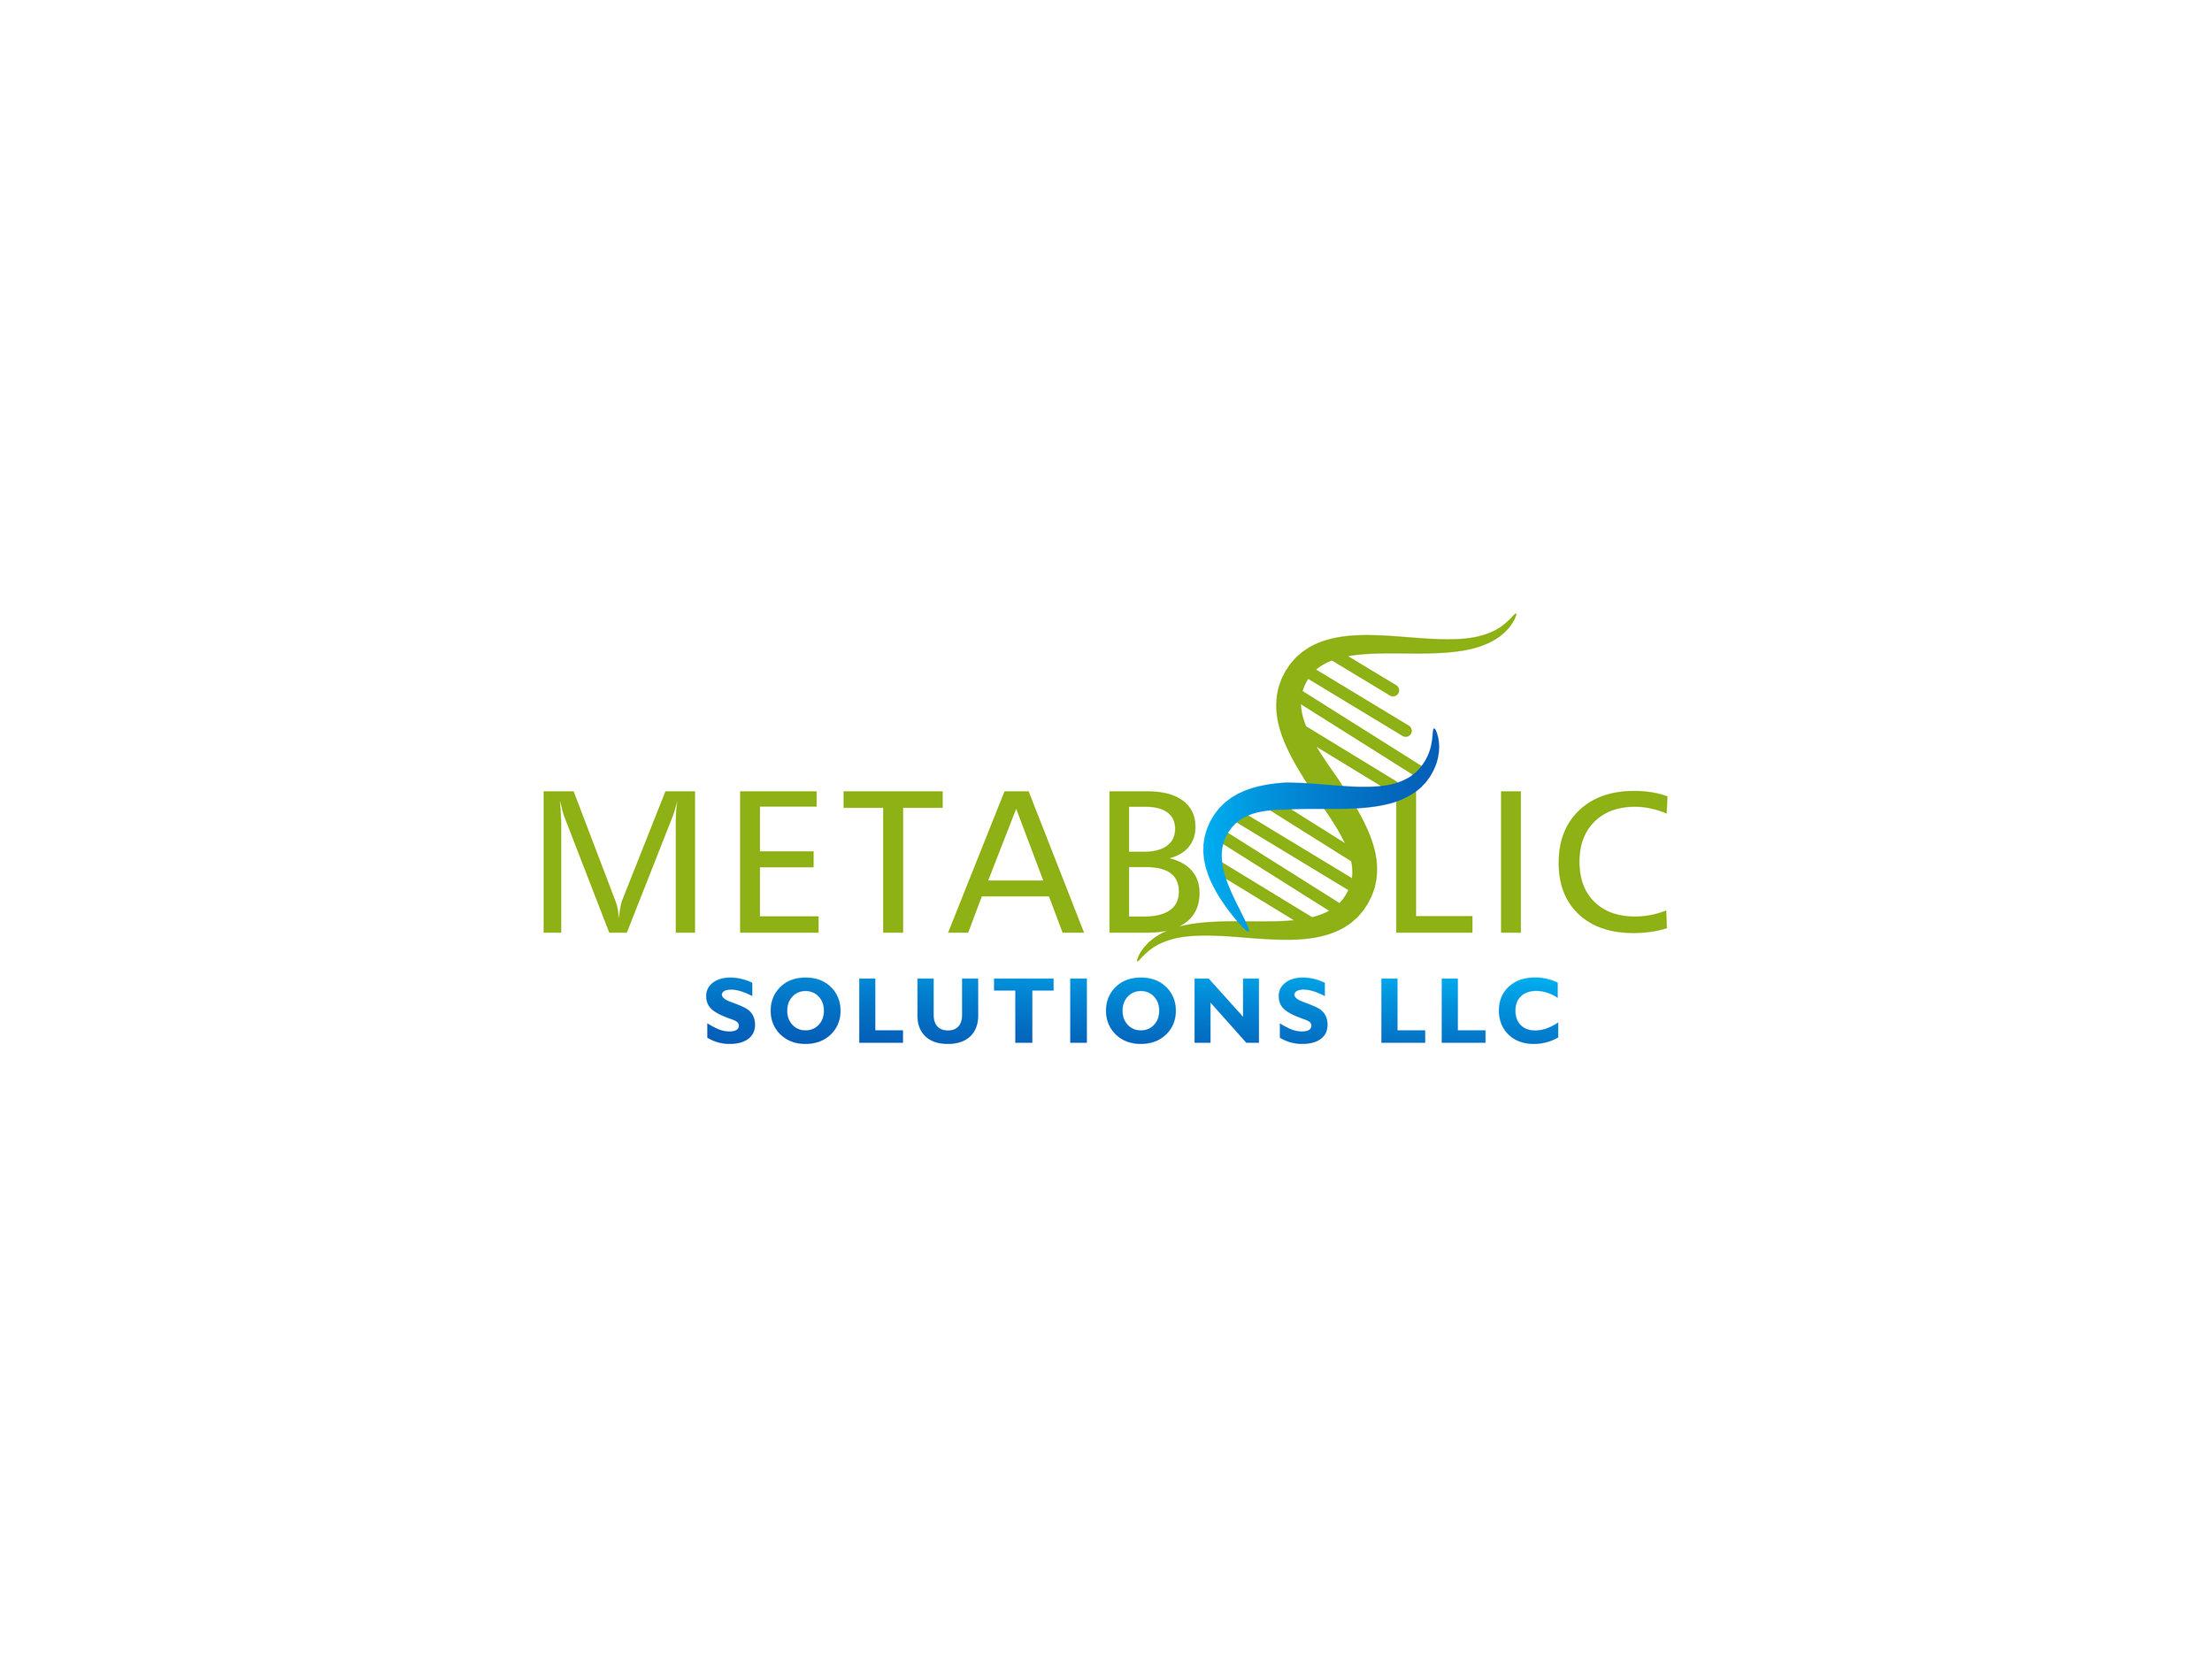 Metabolic Solutions LLC-01.jpg